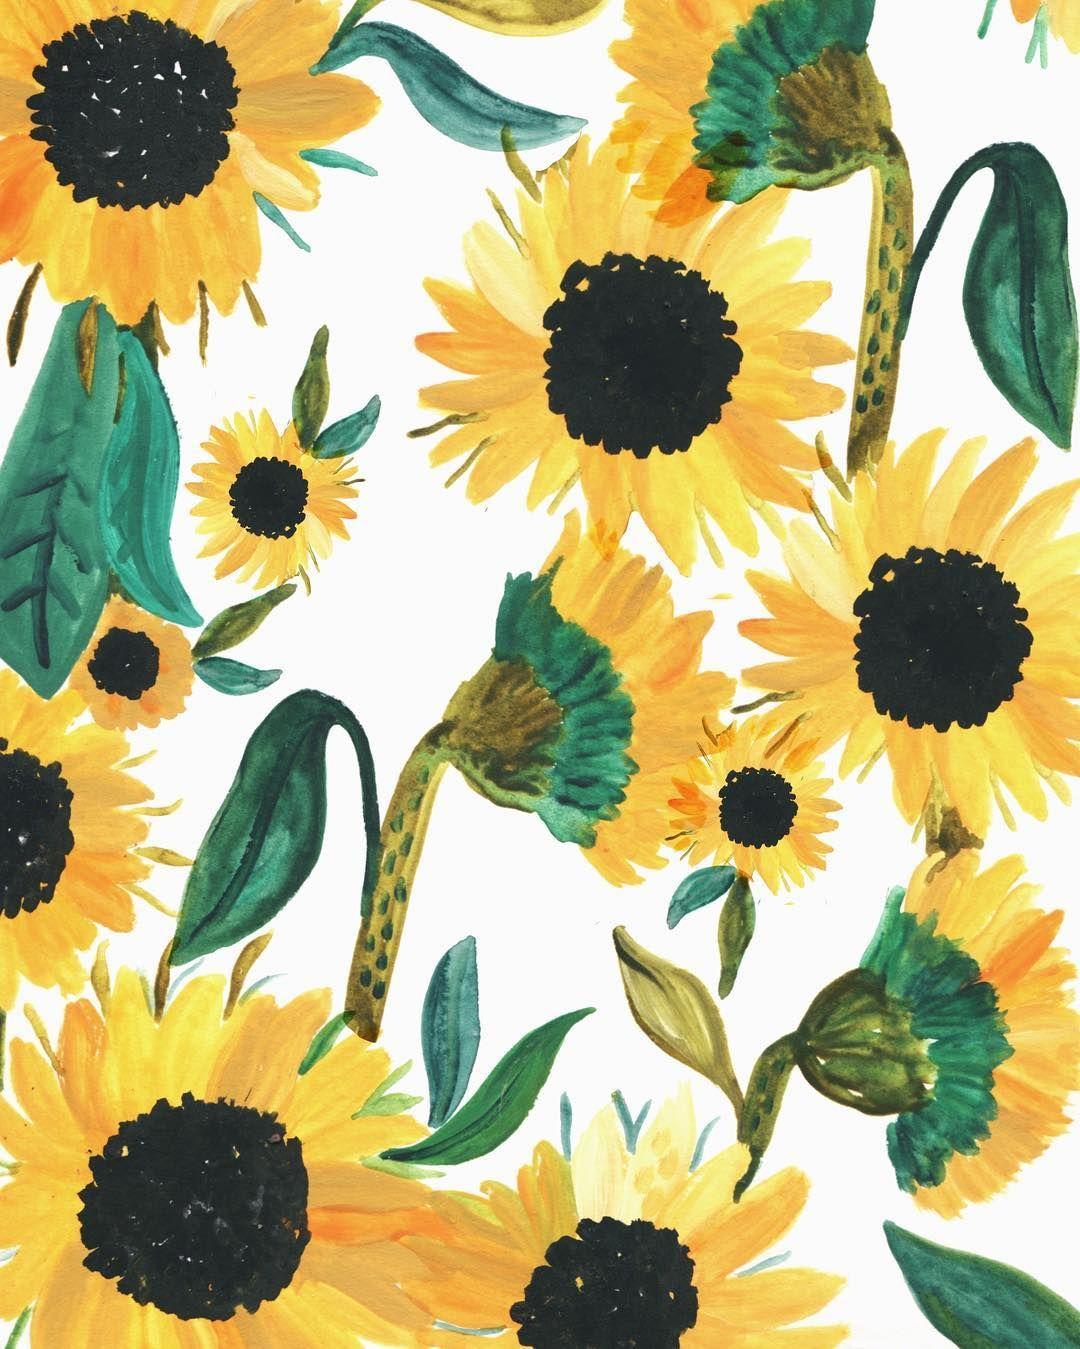 Sunday Sunflowers By Rosieharbottle Papeis De Parede Para